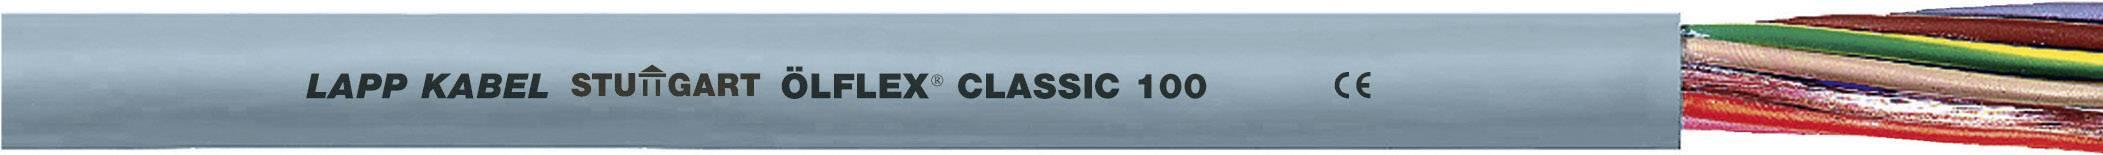 Kabel LappKabel Ölflex CLASSIC 100 7G4 (0010103), PVC, 15,2 mm, 750 V, šedá, 500 m